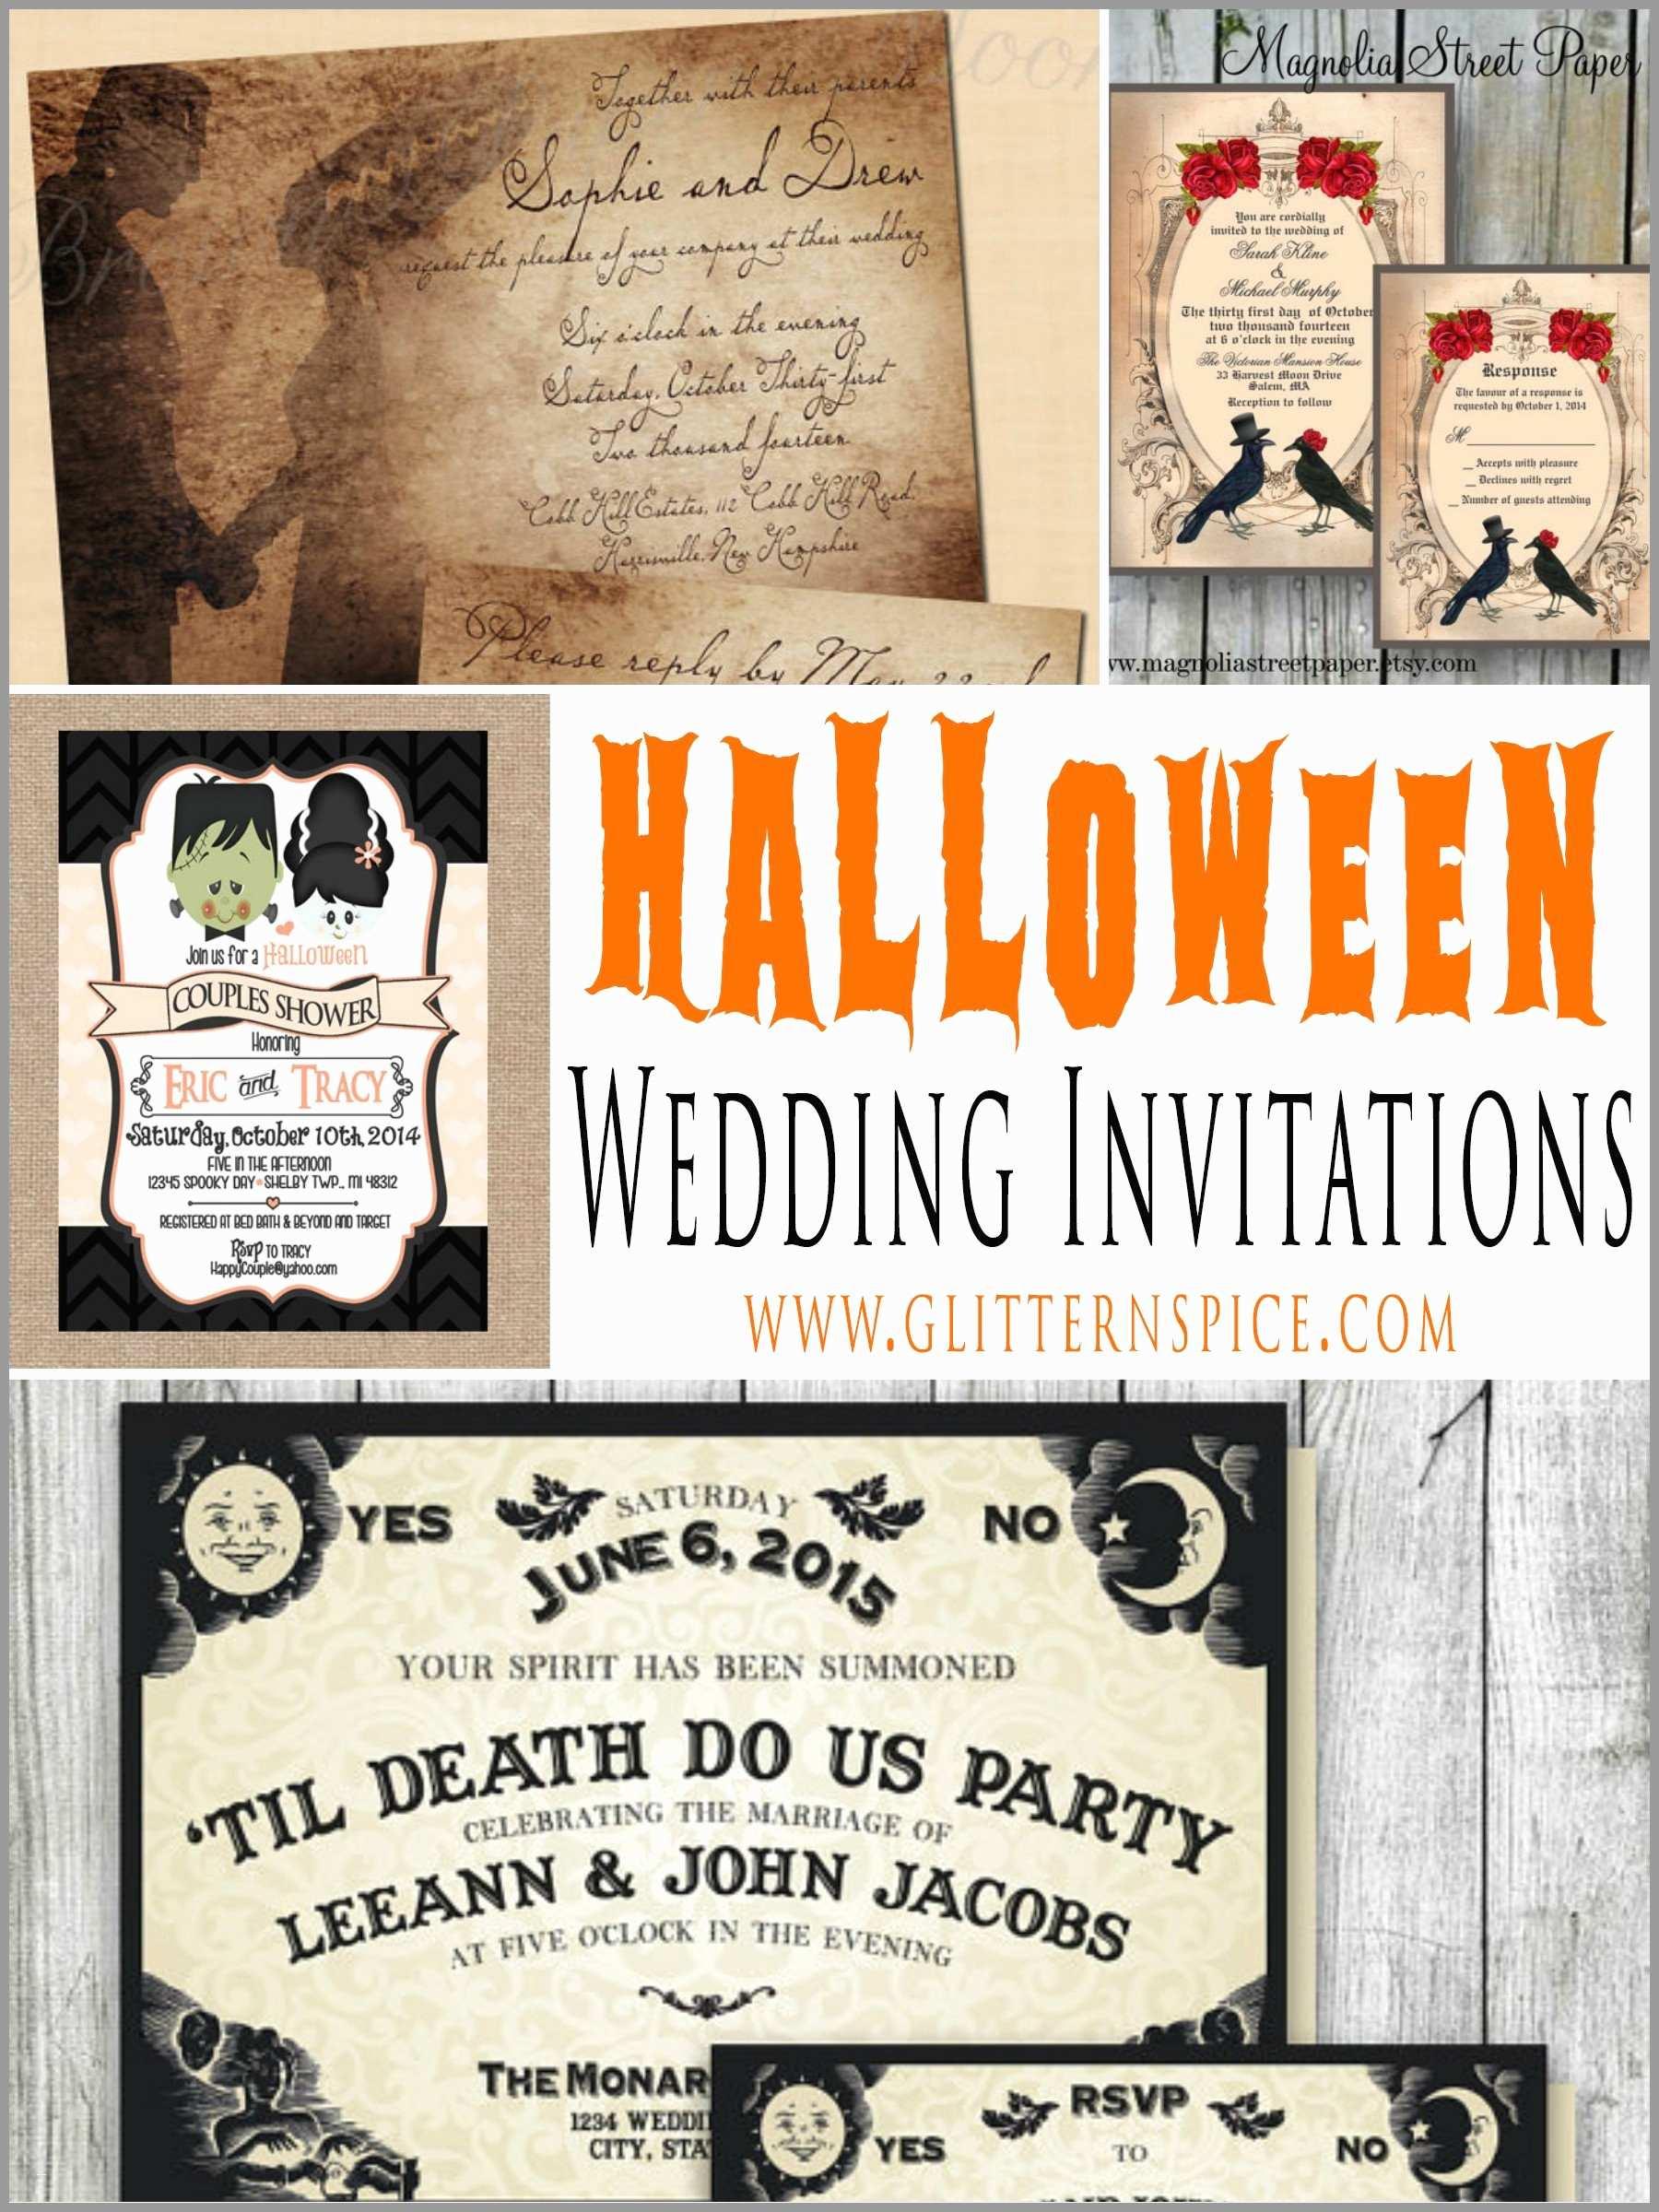 Free Printable Halloween Wedding Invitation Templates - Free Printable Halloween Wedding Invitations